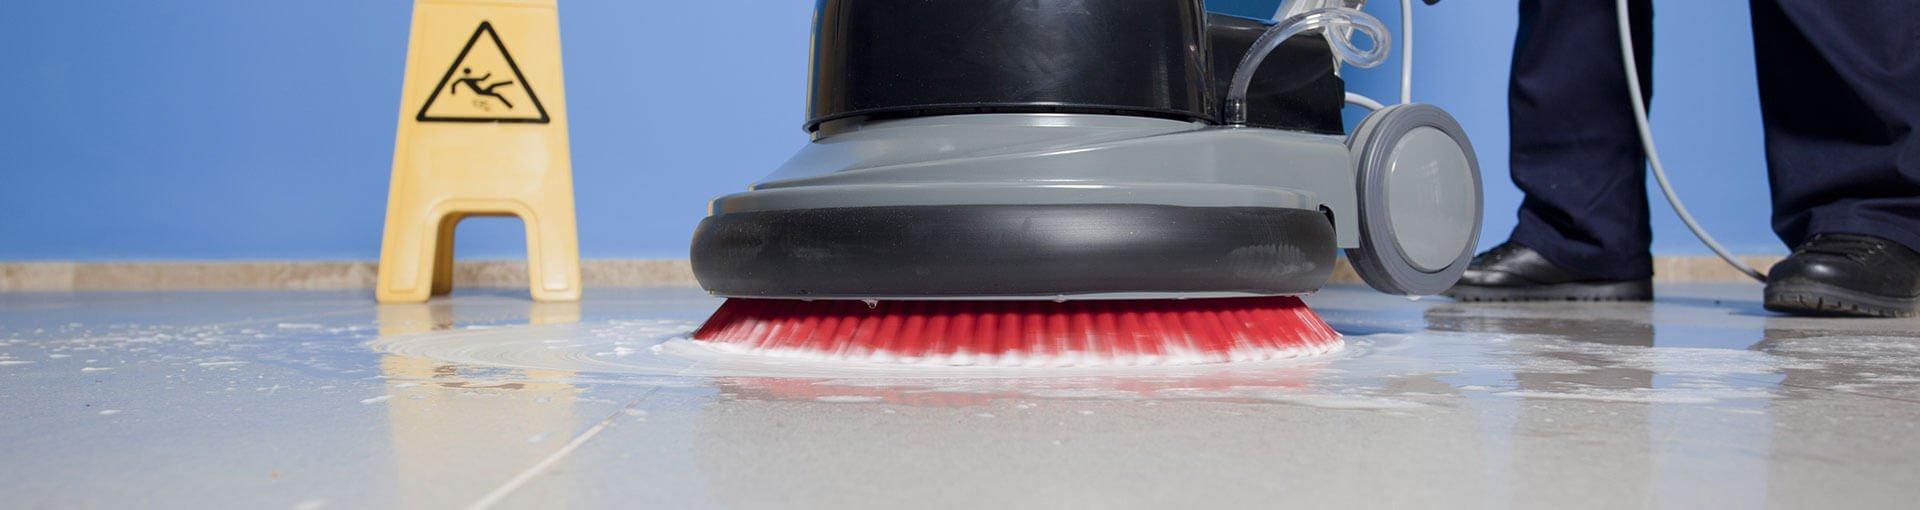 Cleaning Equipment Avance International Supplies Ltd